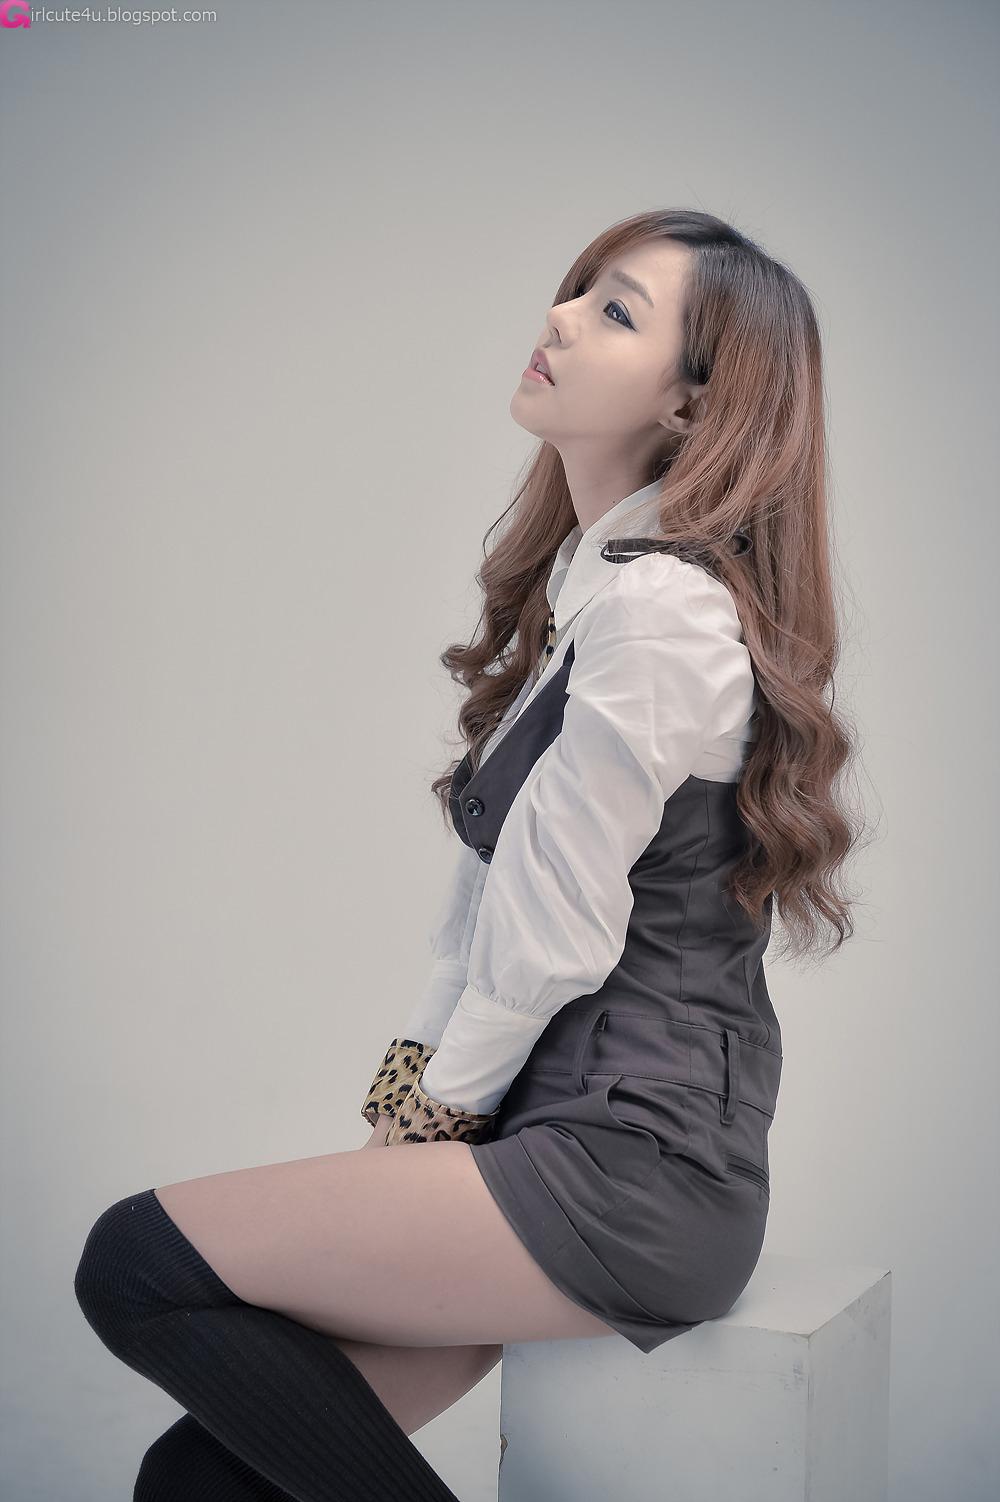 Gorgeous Seo Jin Ah ~ Cute Girl - Asian Girl - Korean Girl